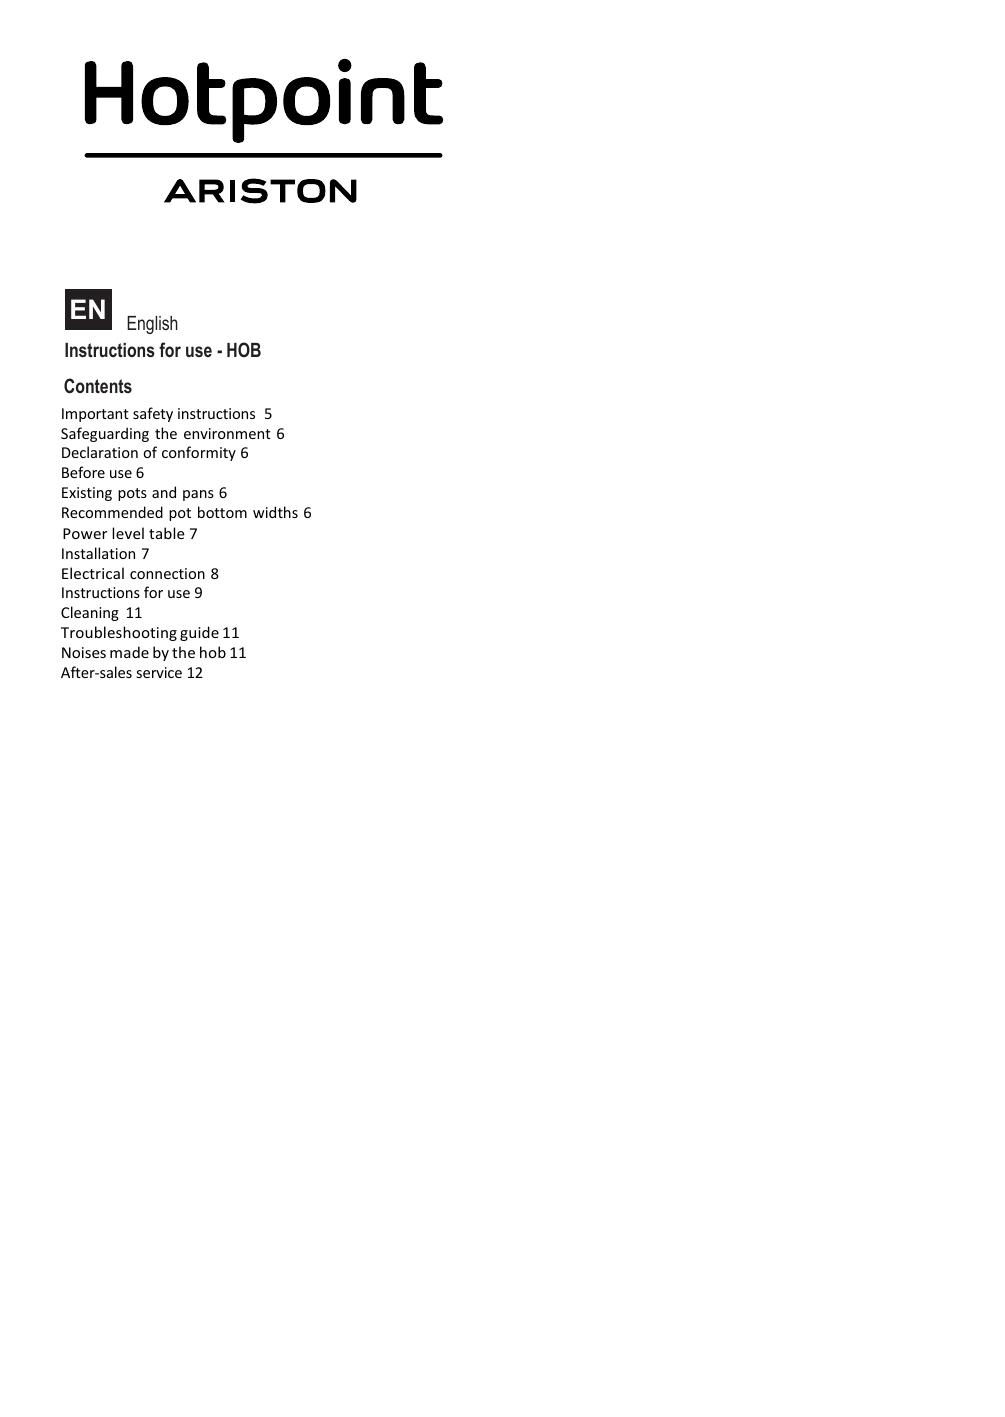 Hotpoint KID 640 B Instruction for Use   manualzz com